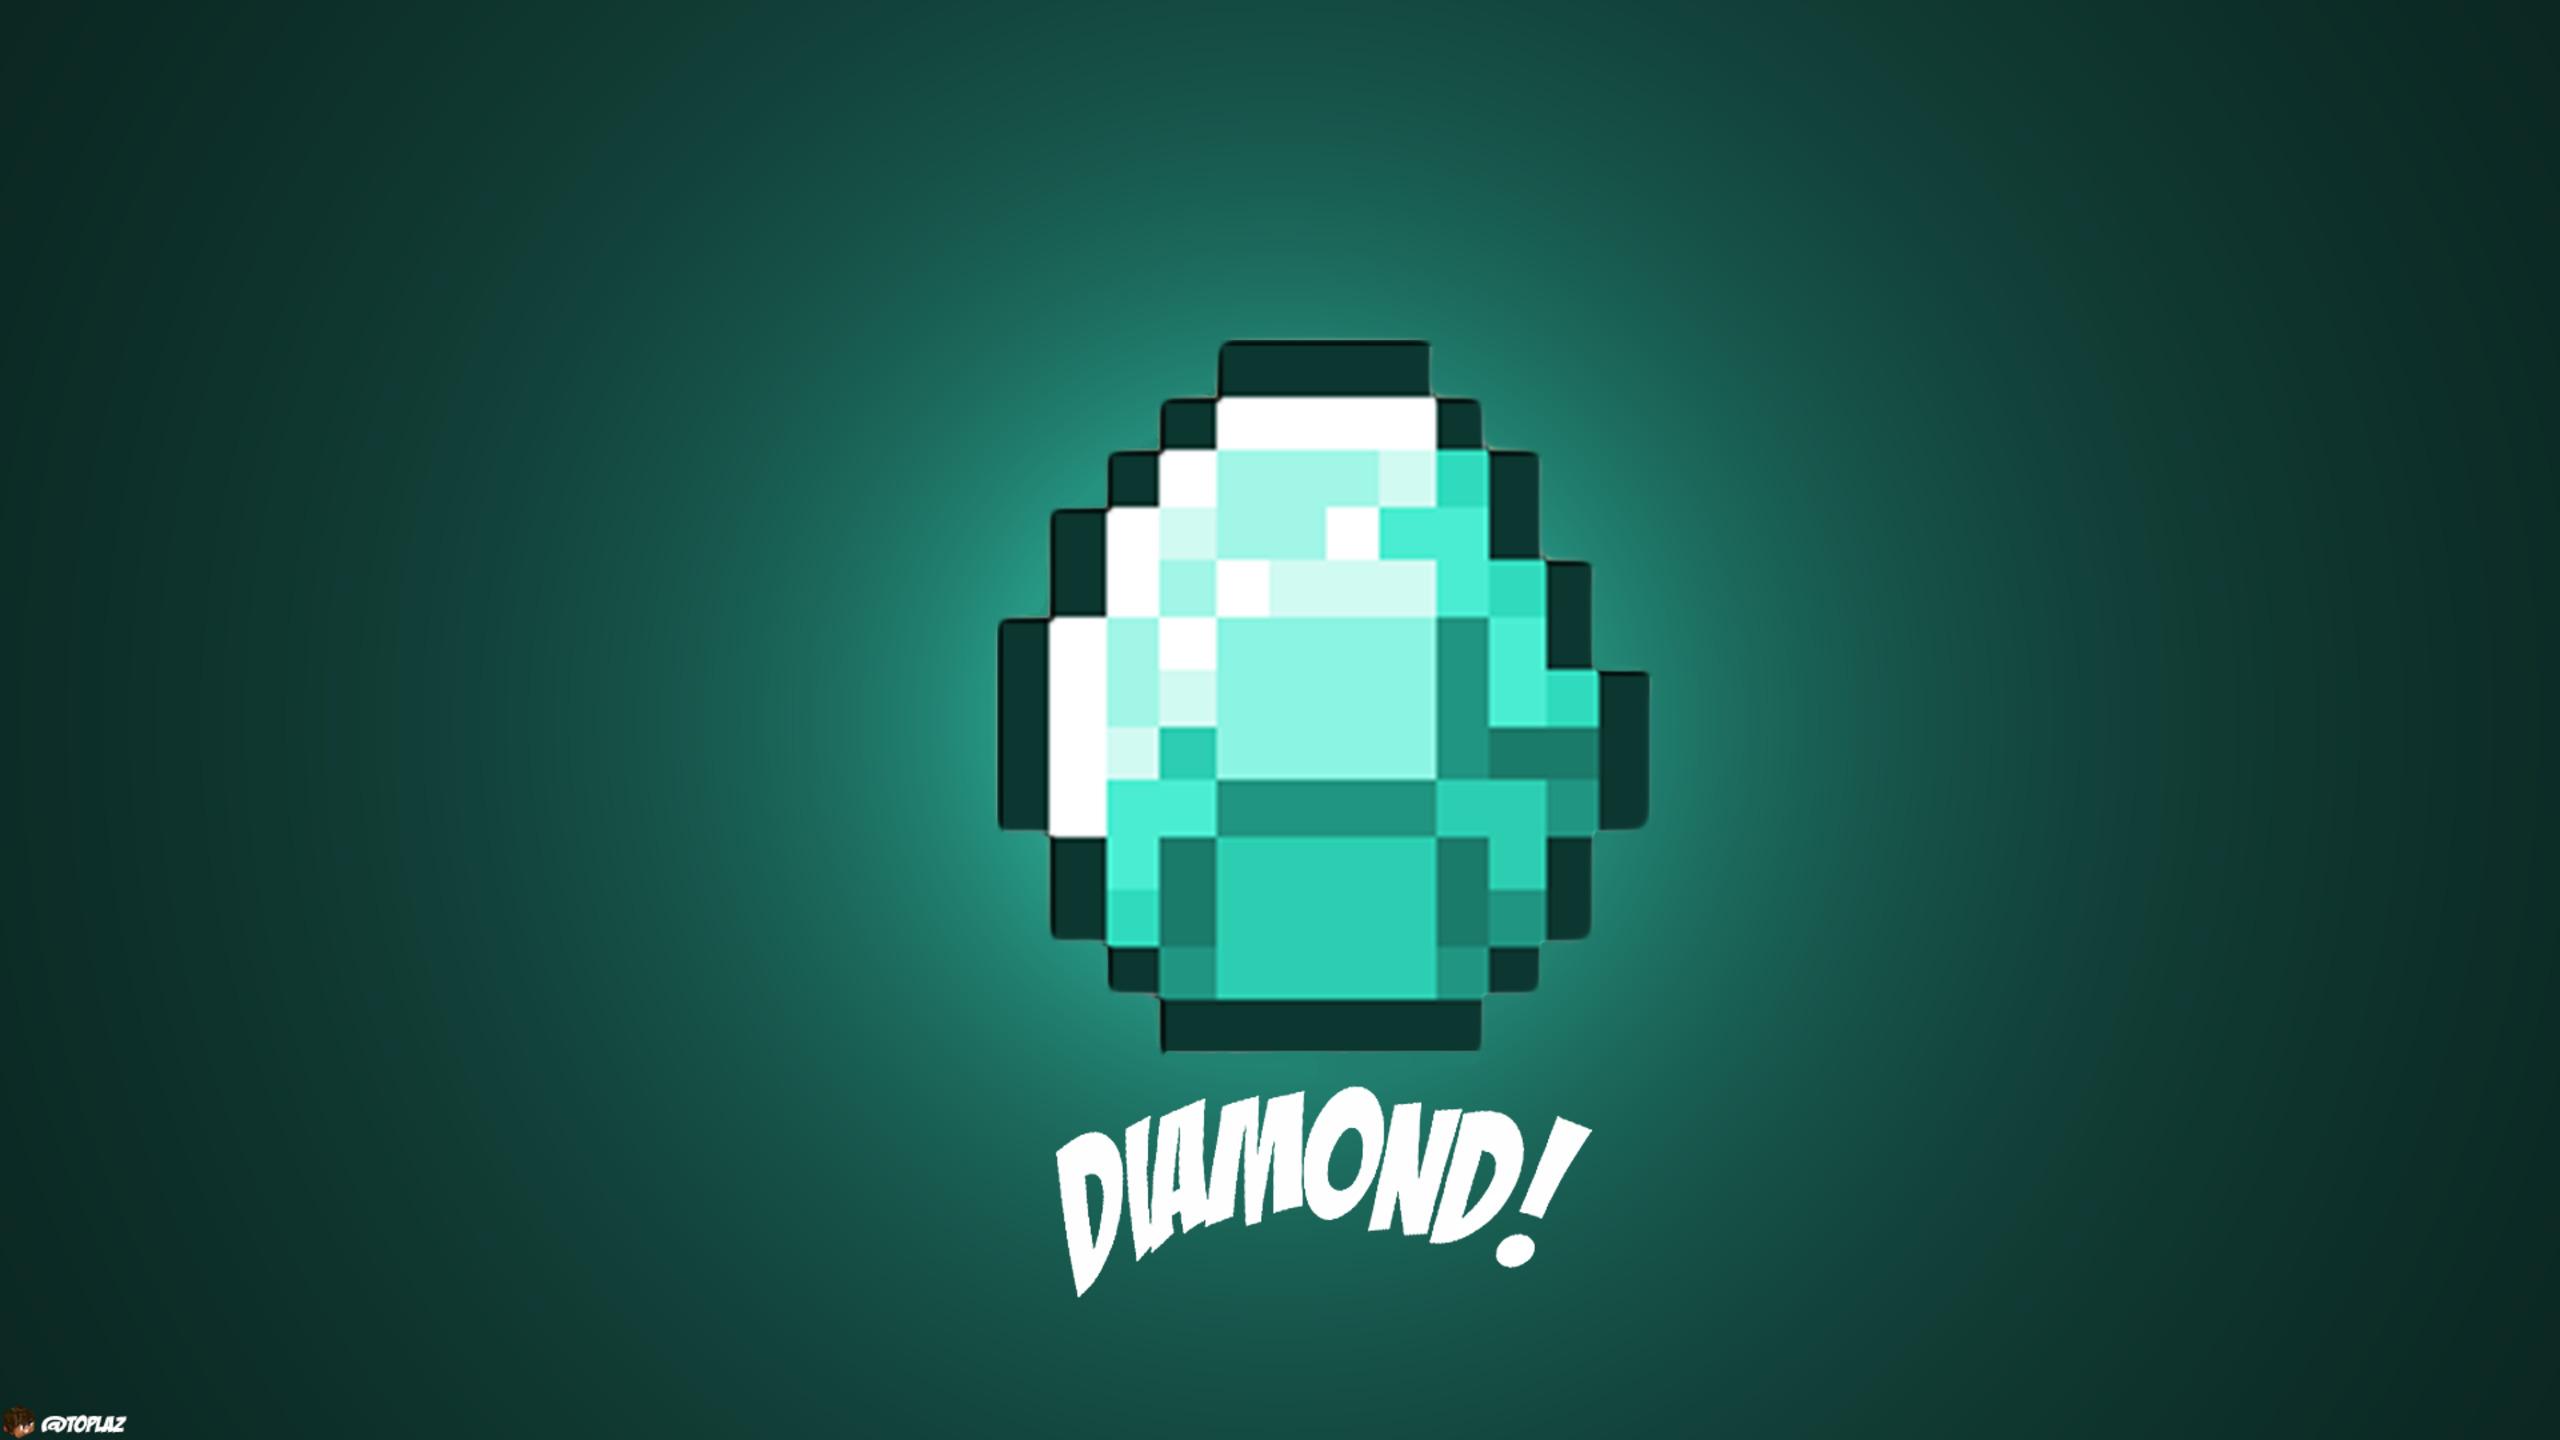 2560x1440 diamond minecraft 1440p resolution hd 4k